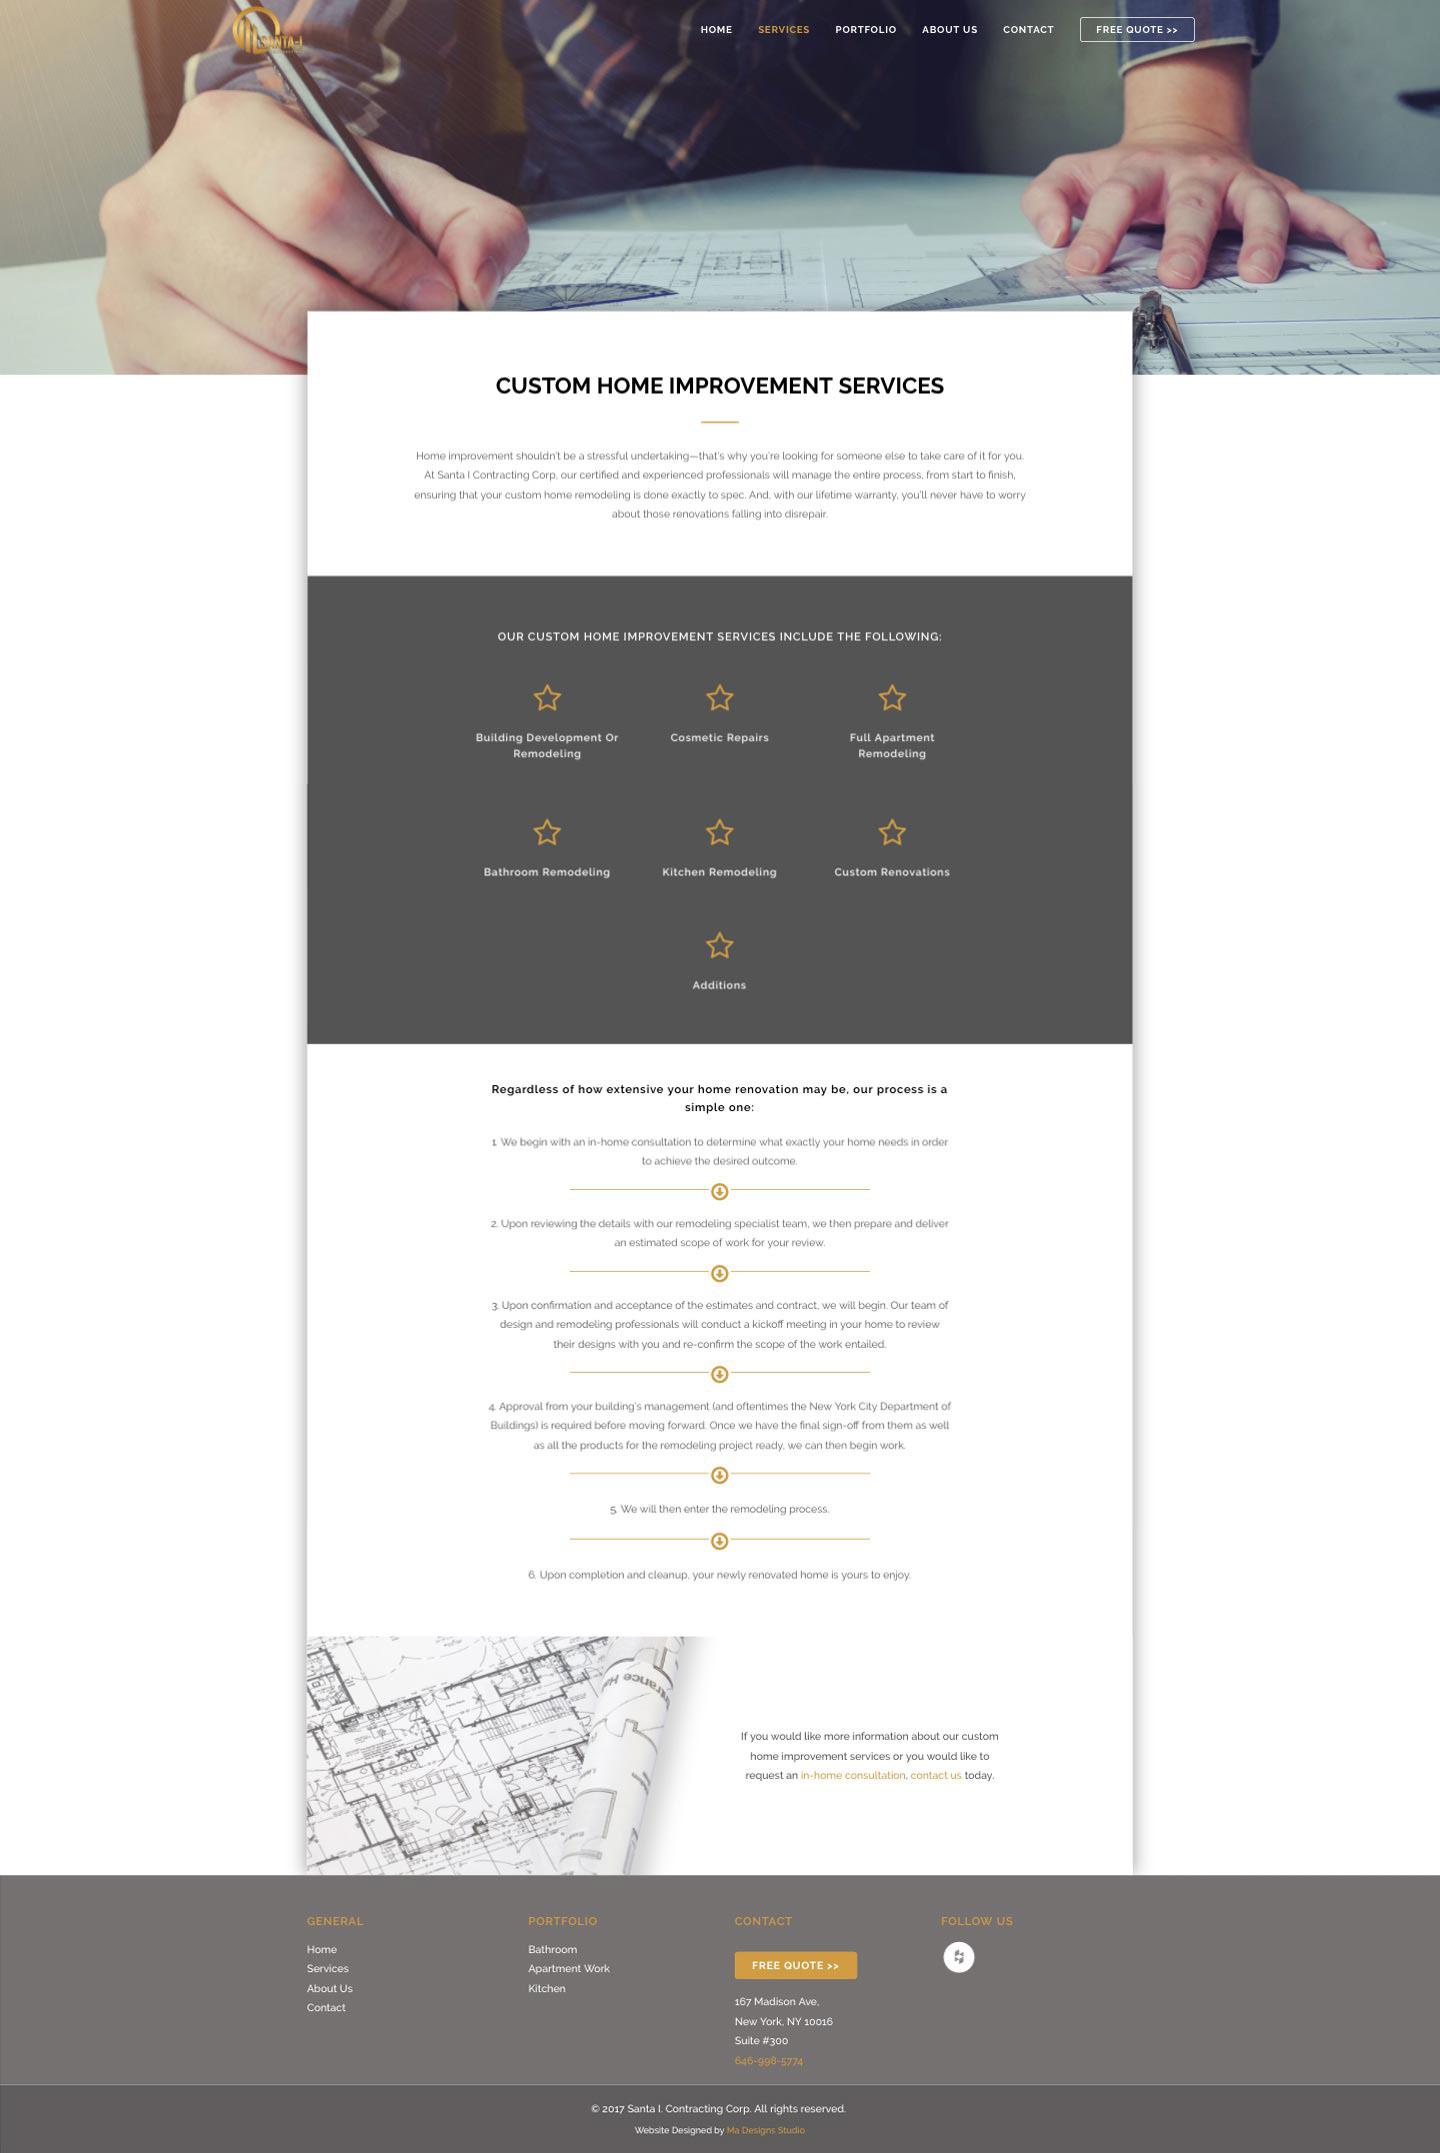 Ma Designs Studio - Santa-I - Web Design and Development